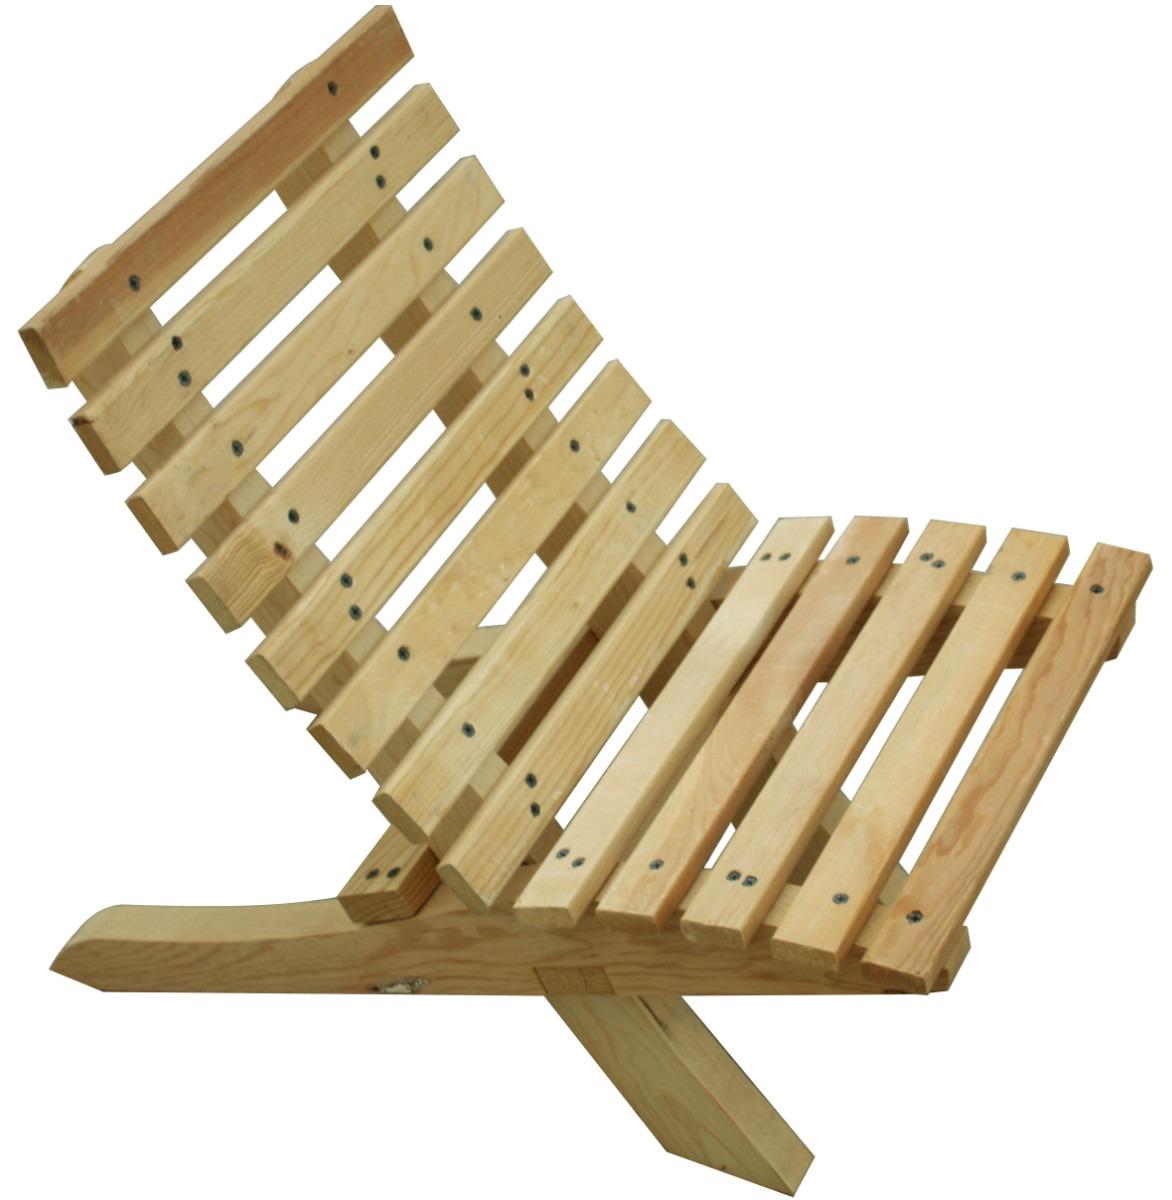 Silla Para Niño Mueble Plegable Madera Jardin O Interiores - $ 99.00 ...